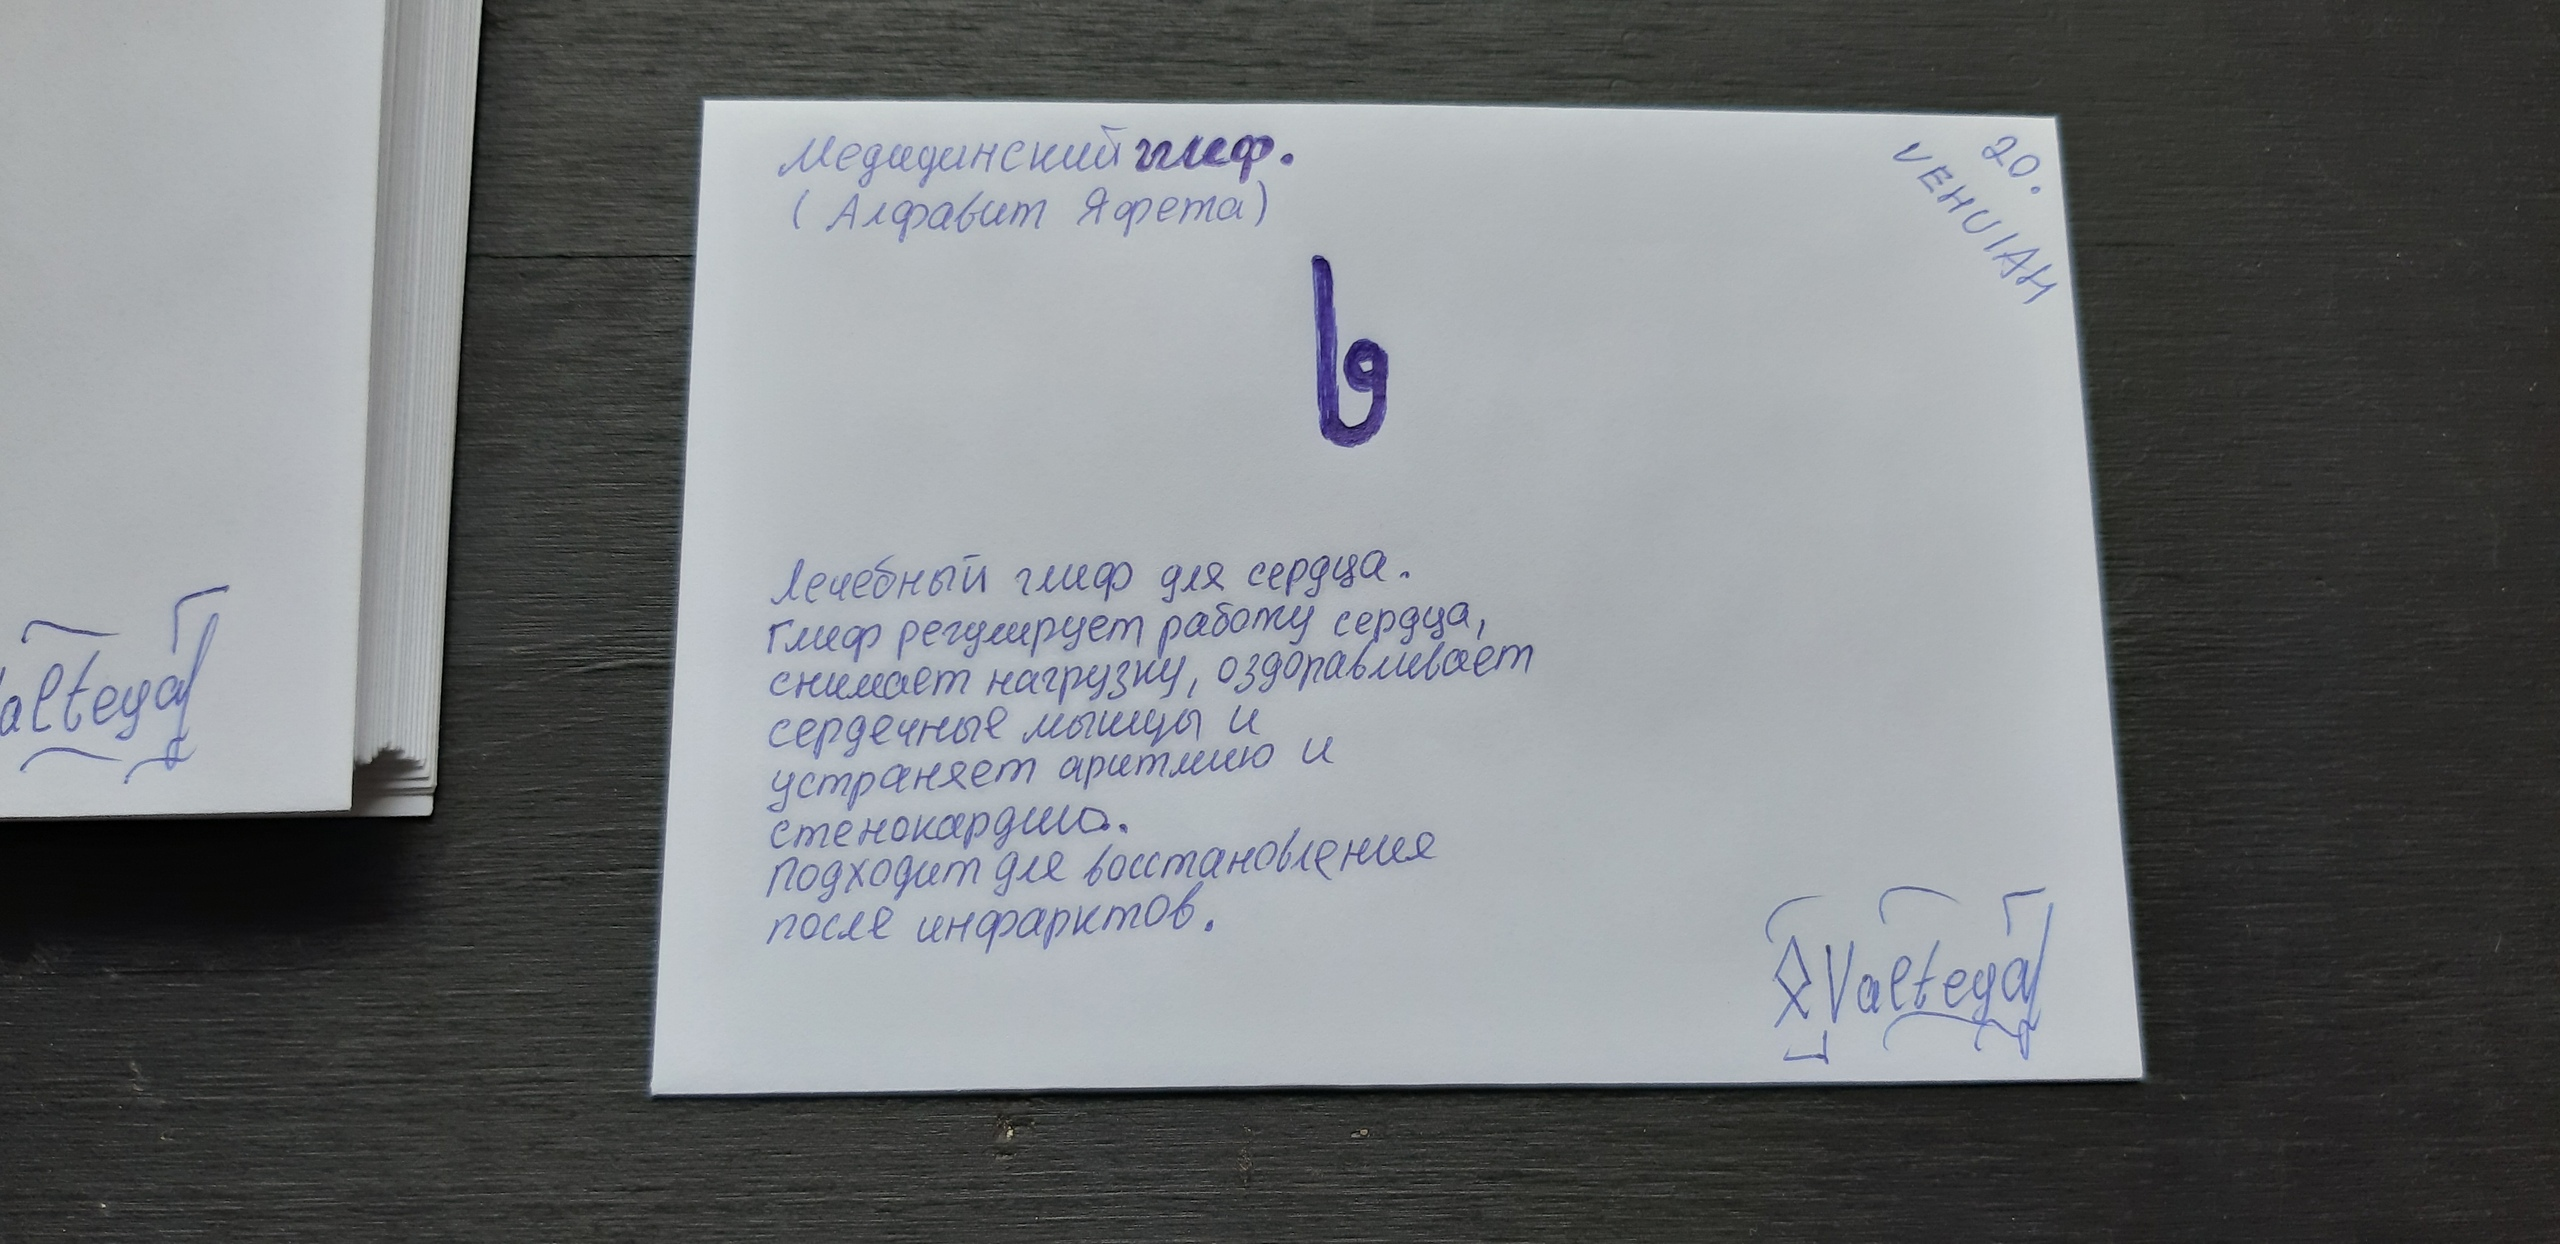 Конверты медицинские глифы. Алфавит Яфета -caEpAkg8NI